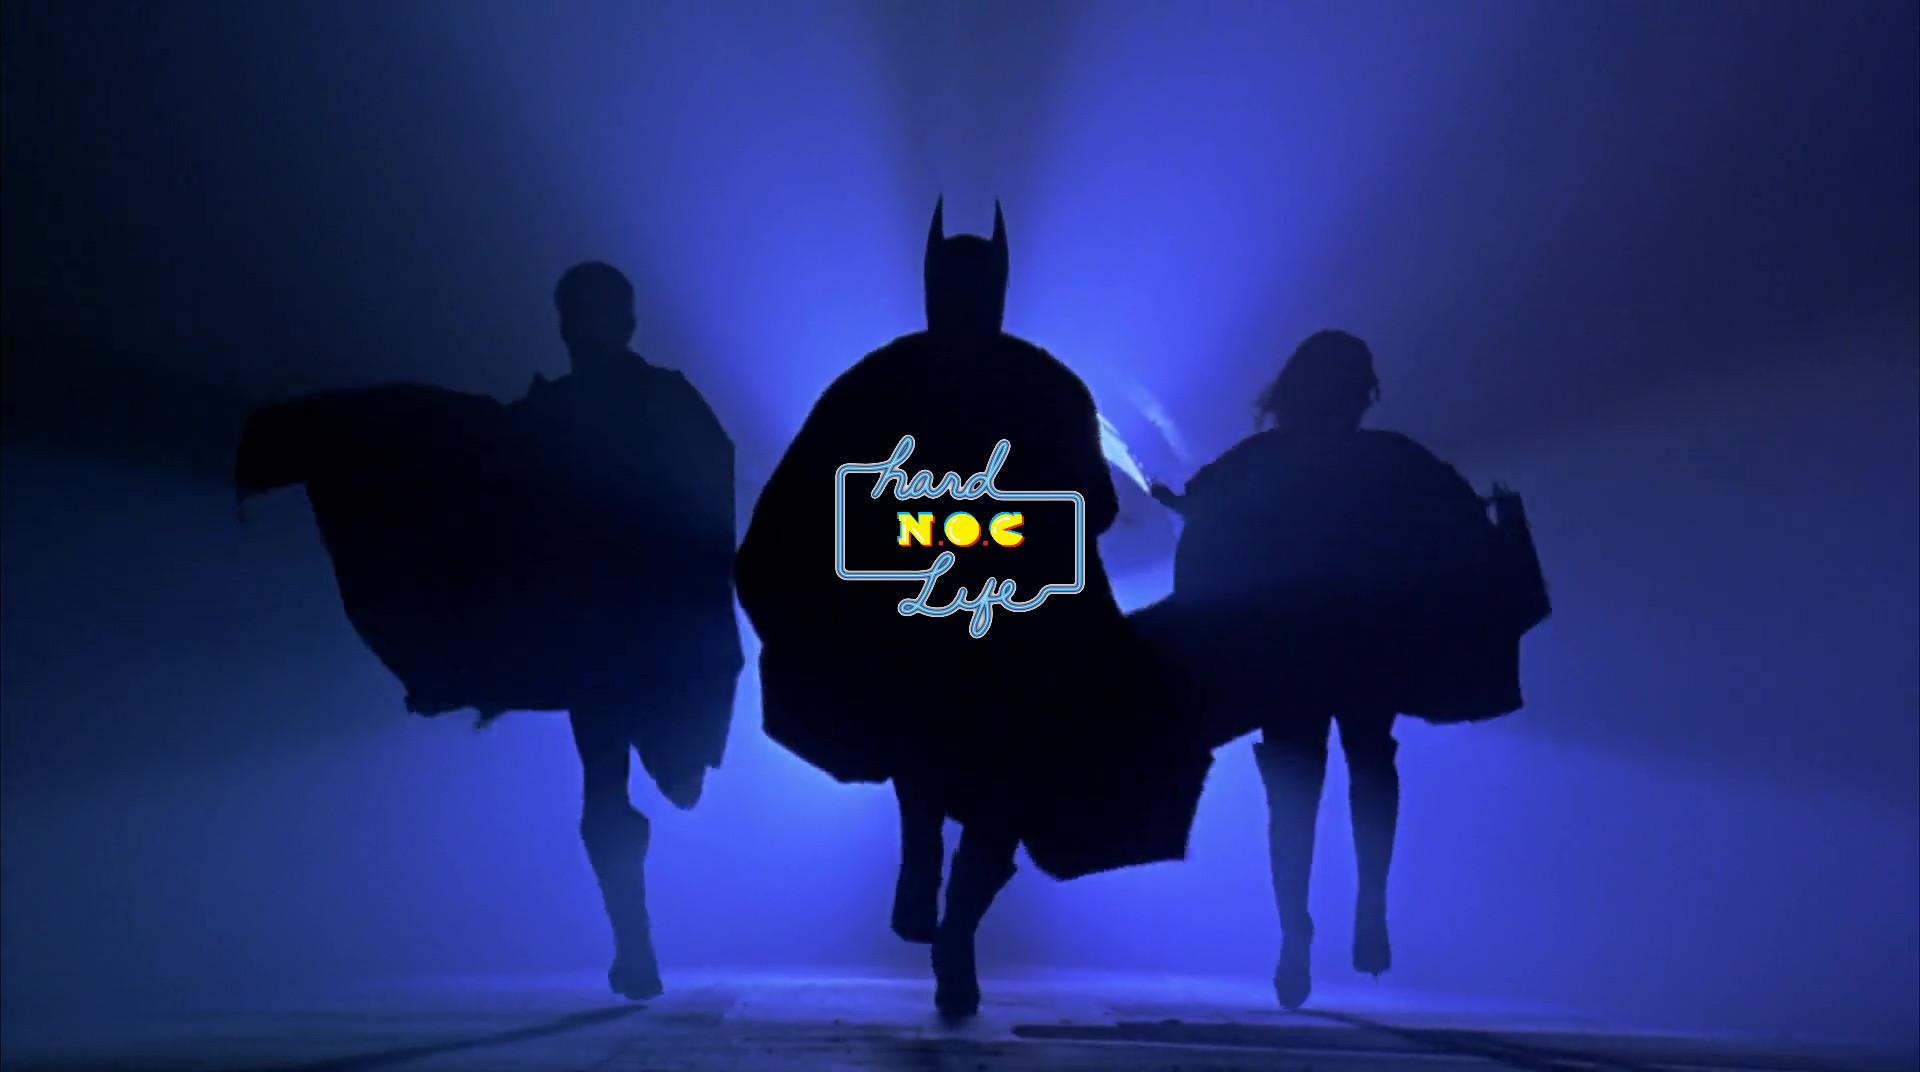 Hard NOC Life: Batman Pride Forever